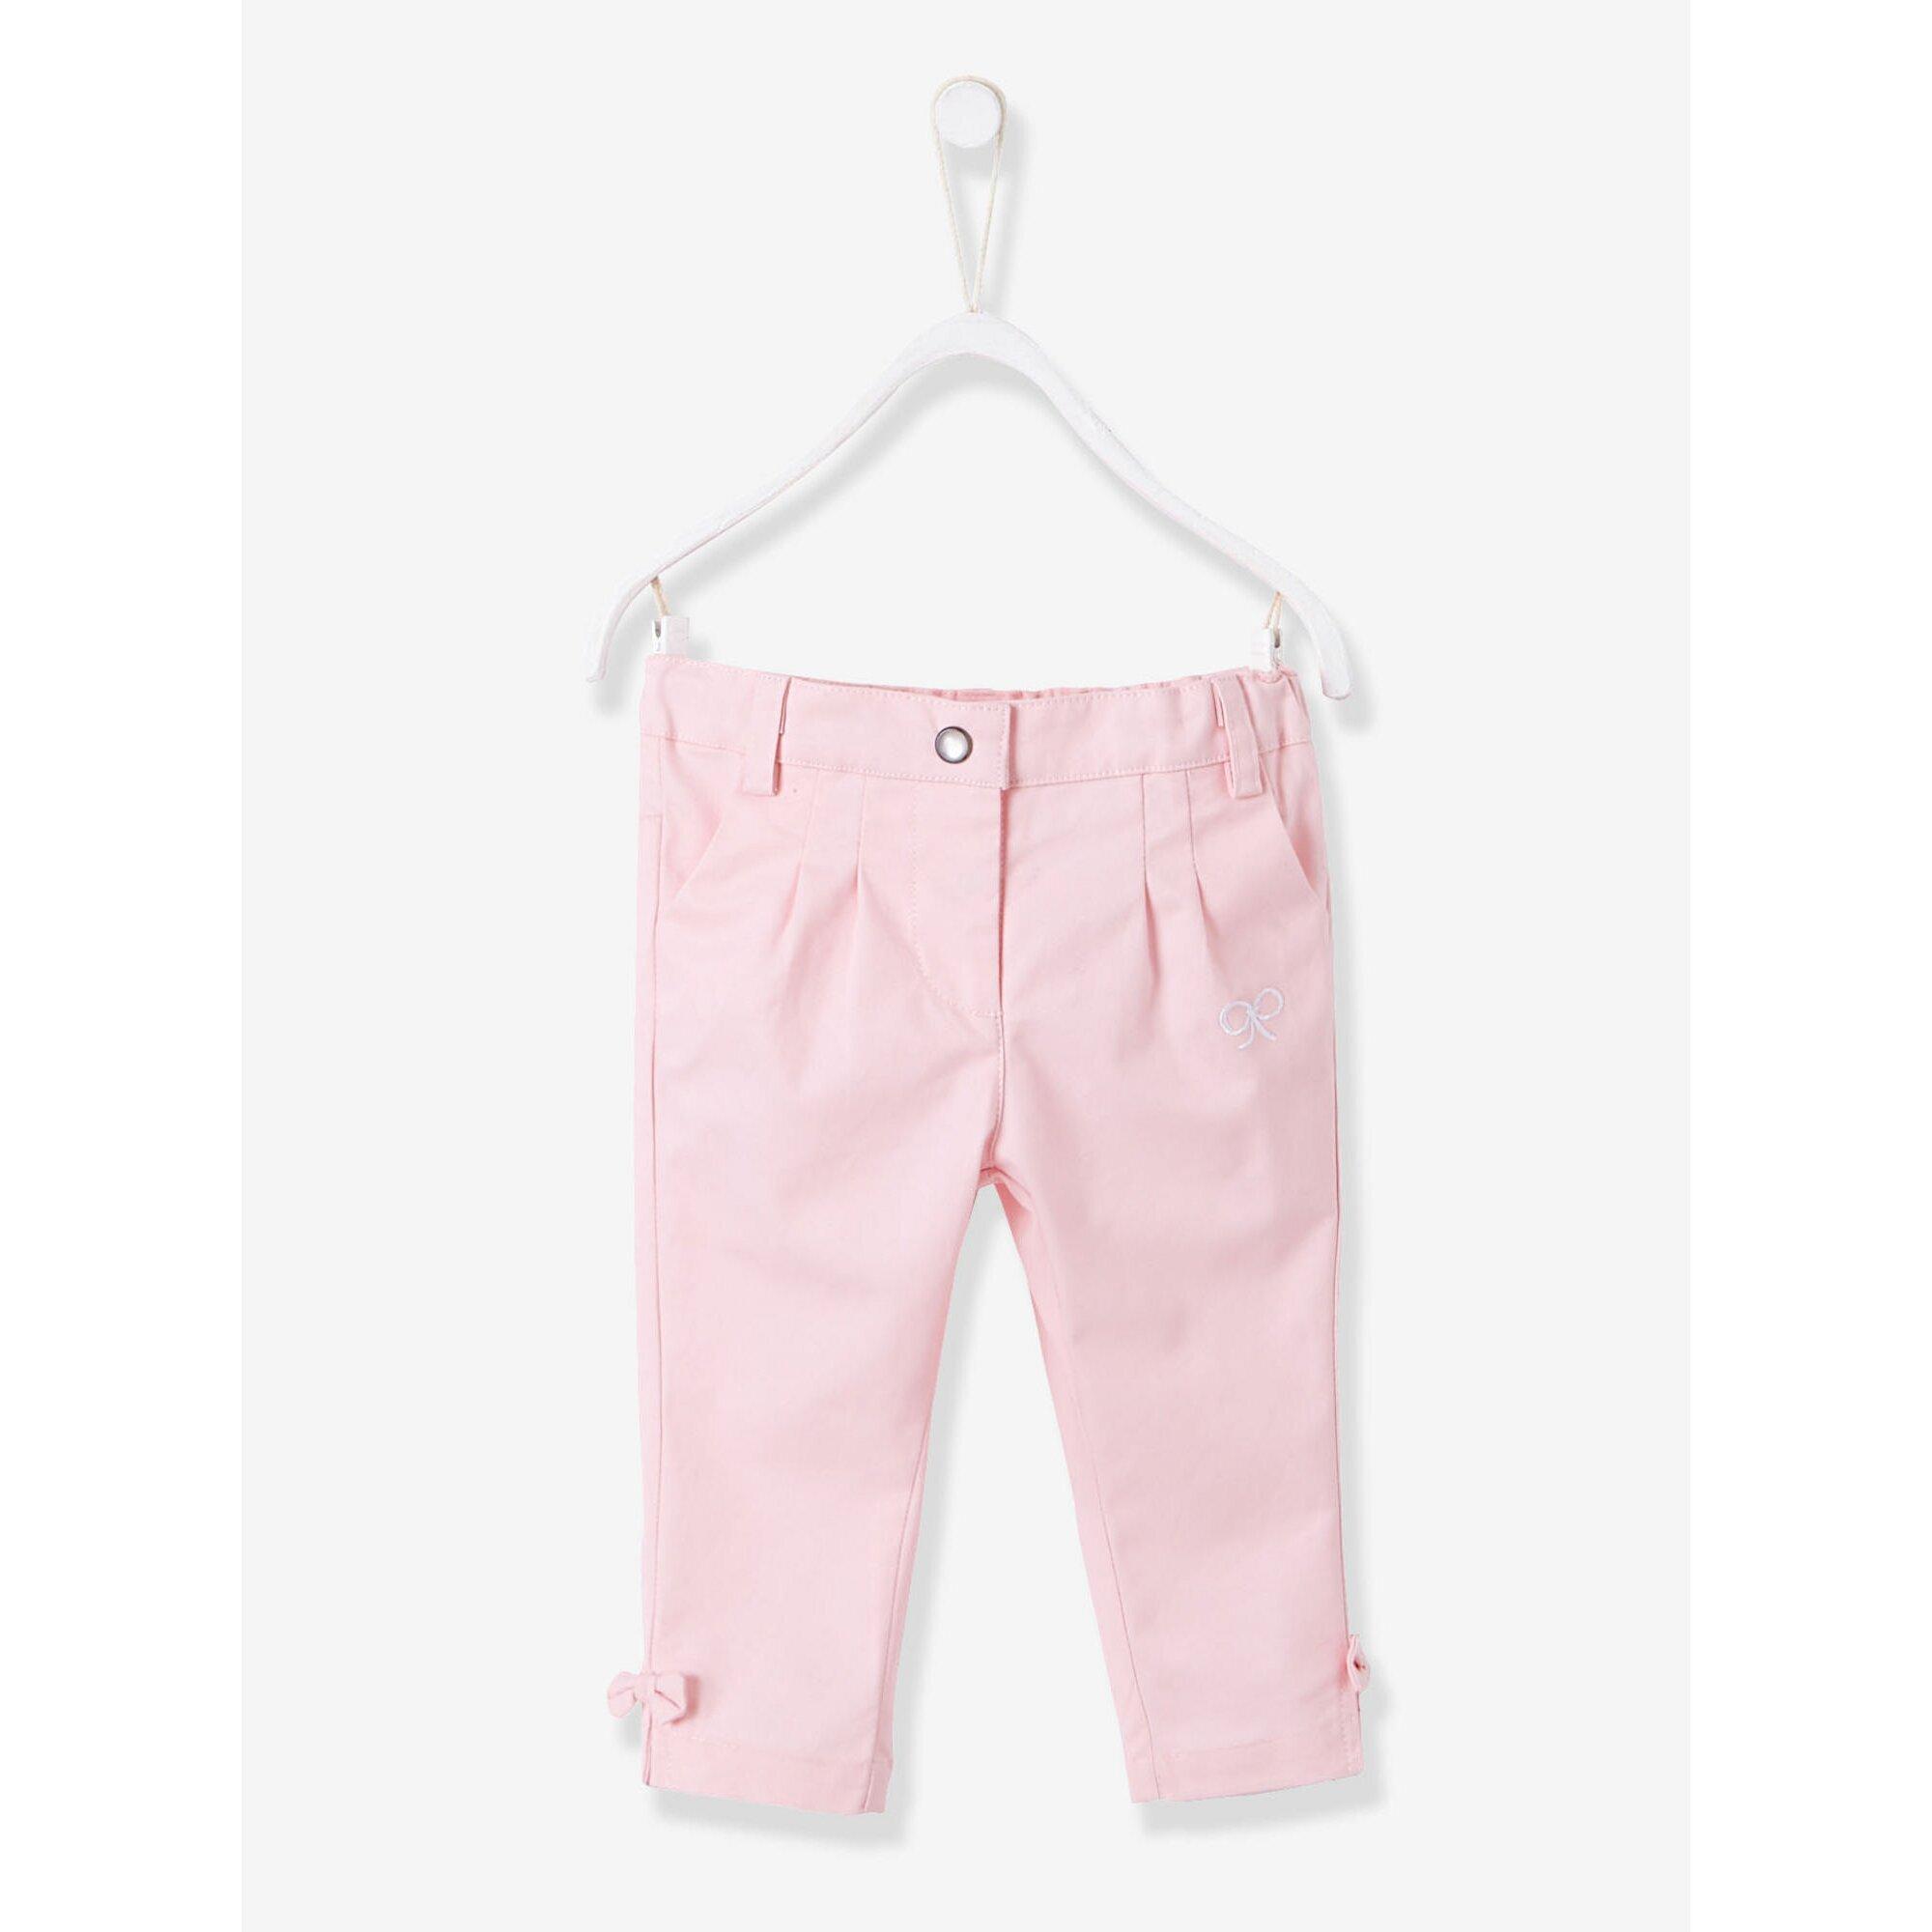 vertbaudet-set-fur-baby-madchen-bluse-und-hose, 25.99 EUR @ babywalz-de